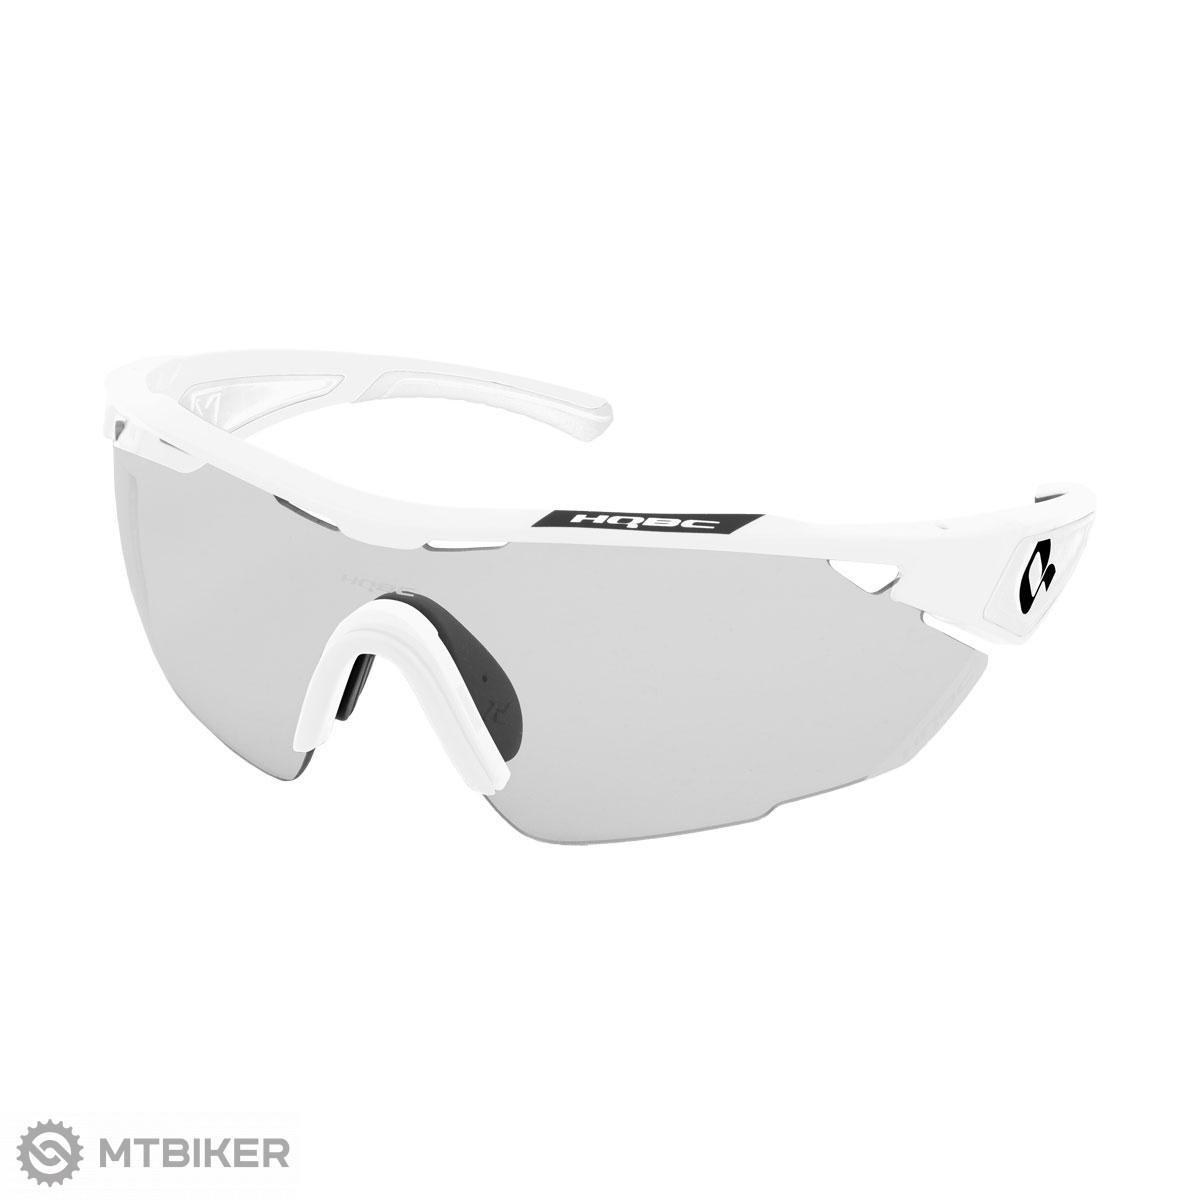 Hqbc okuliare QX3 PLUS biele Photochromic